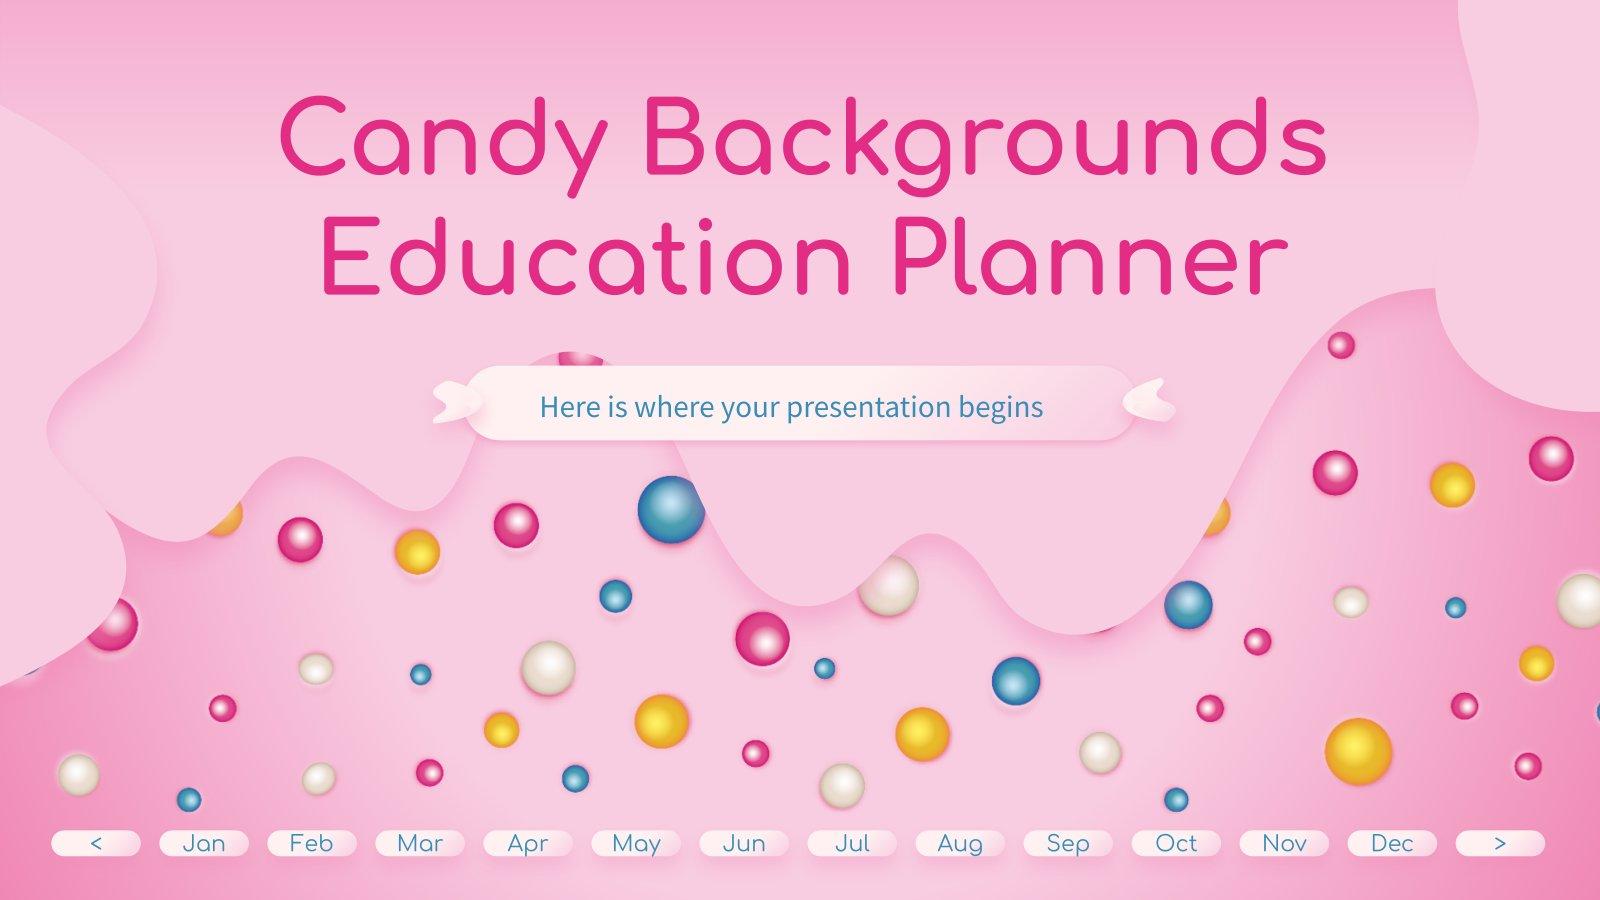 Plantilla de presentación Agenda educativa con fondos de caramelo